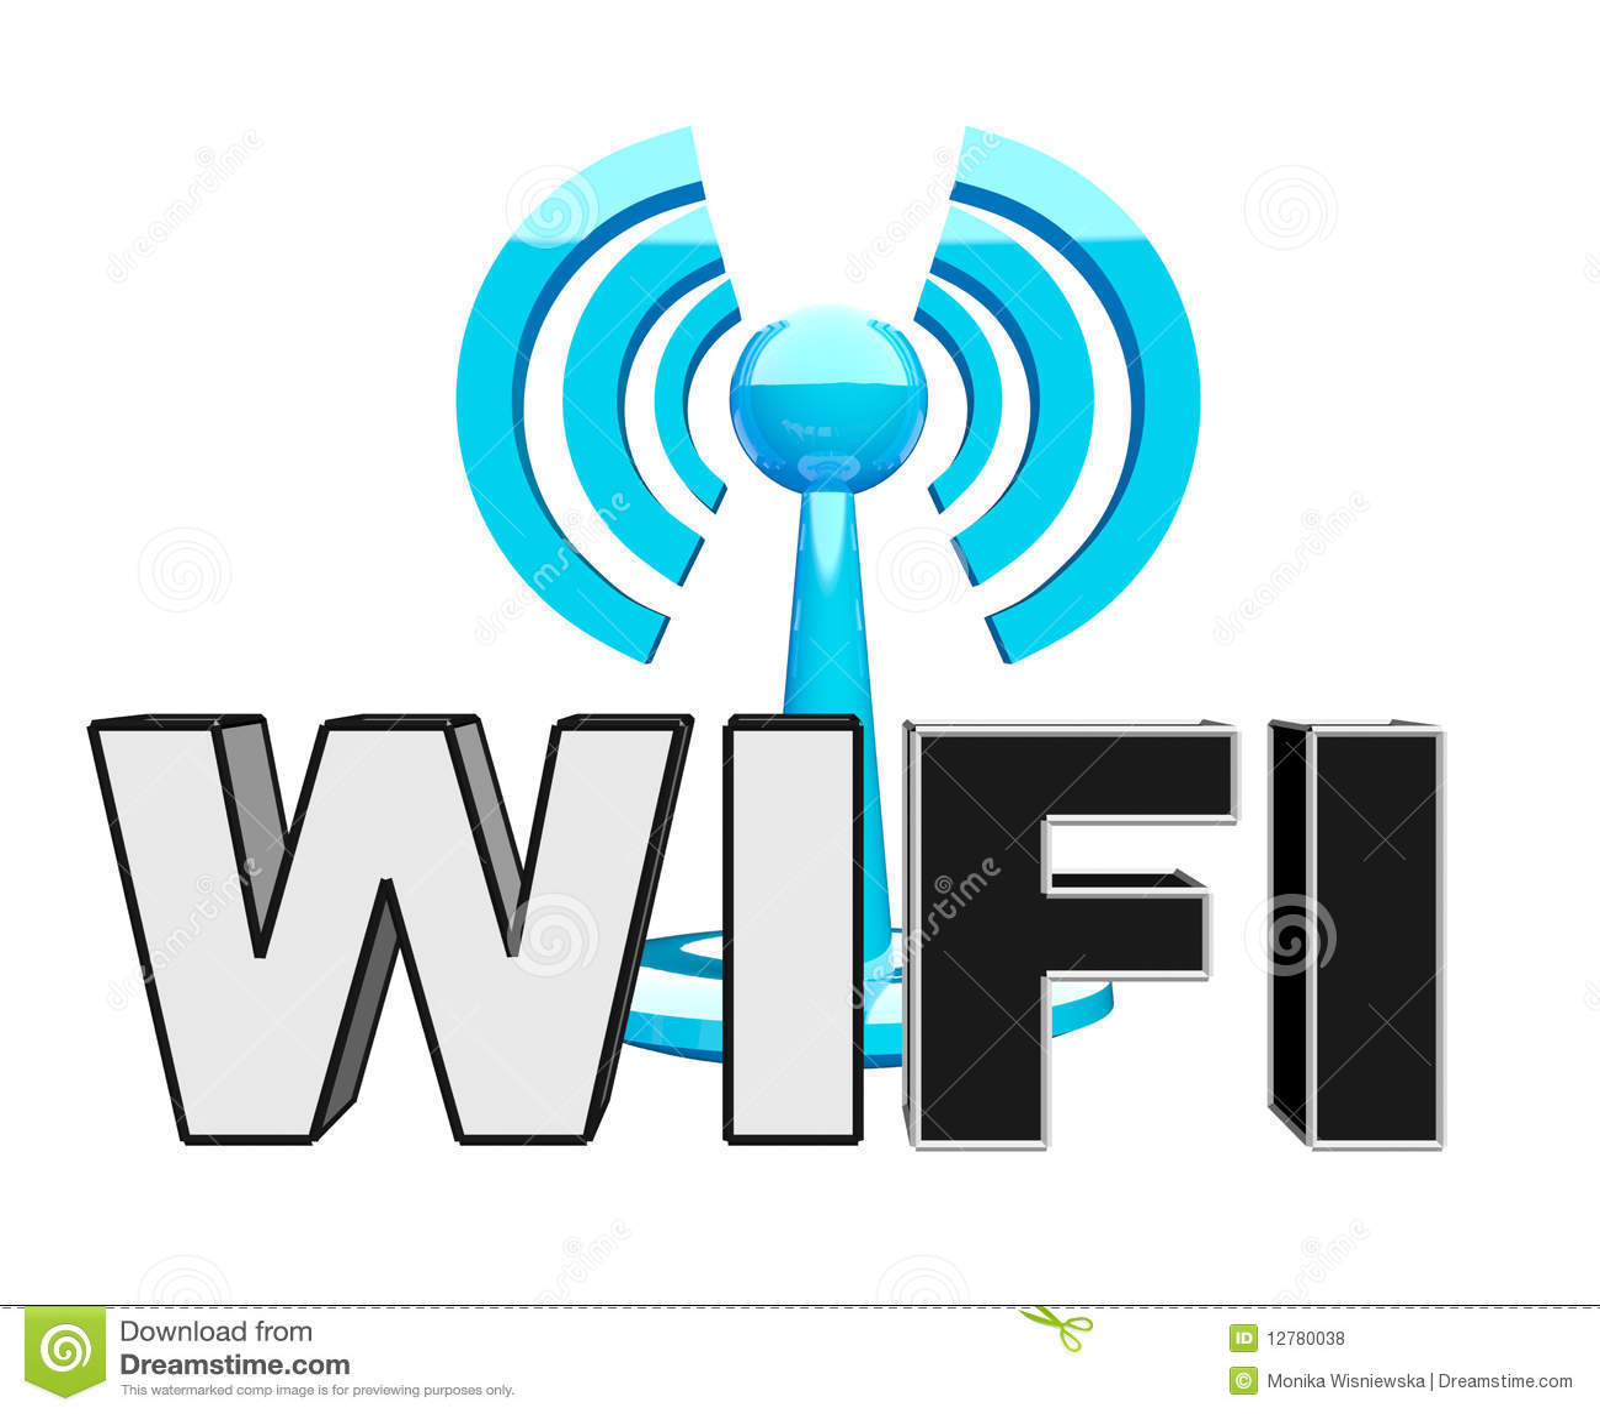 Wifi (drahtlose) Blaue Moderne Ikone Stock Abbildung - Illustration ...